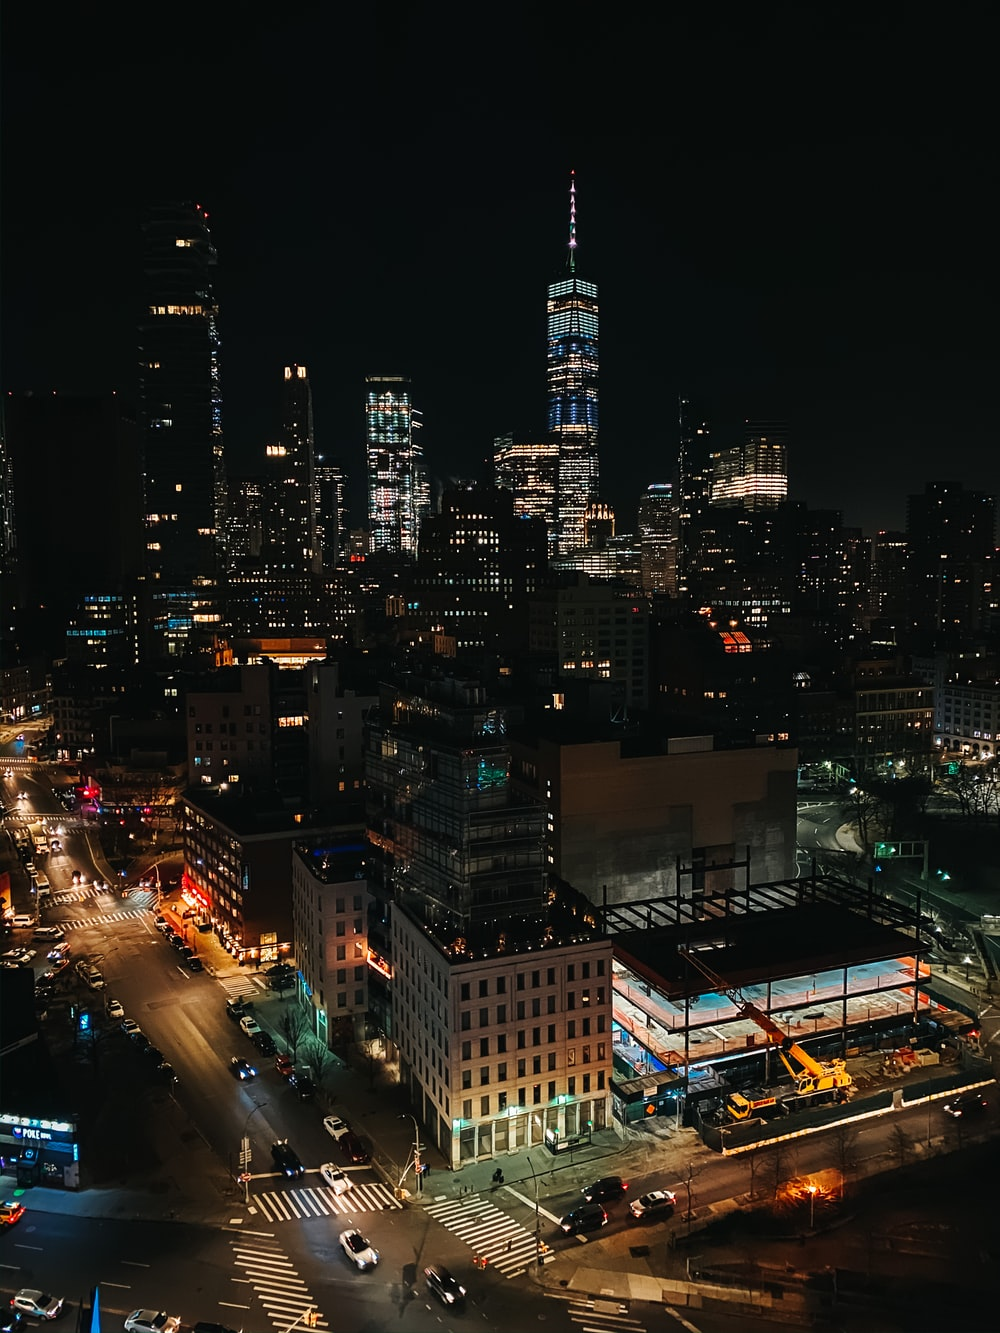 lighted metropolitan building during nighttime